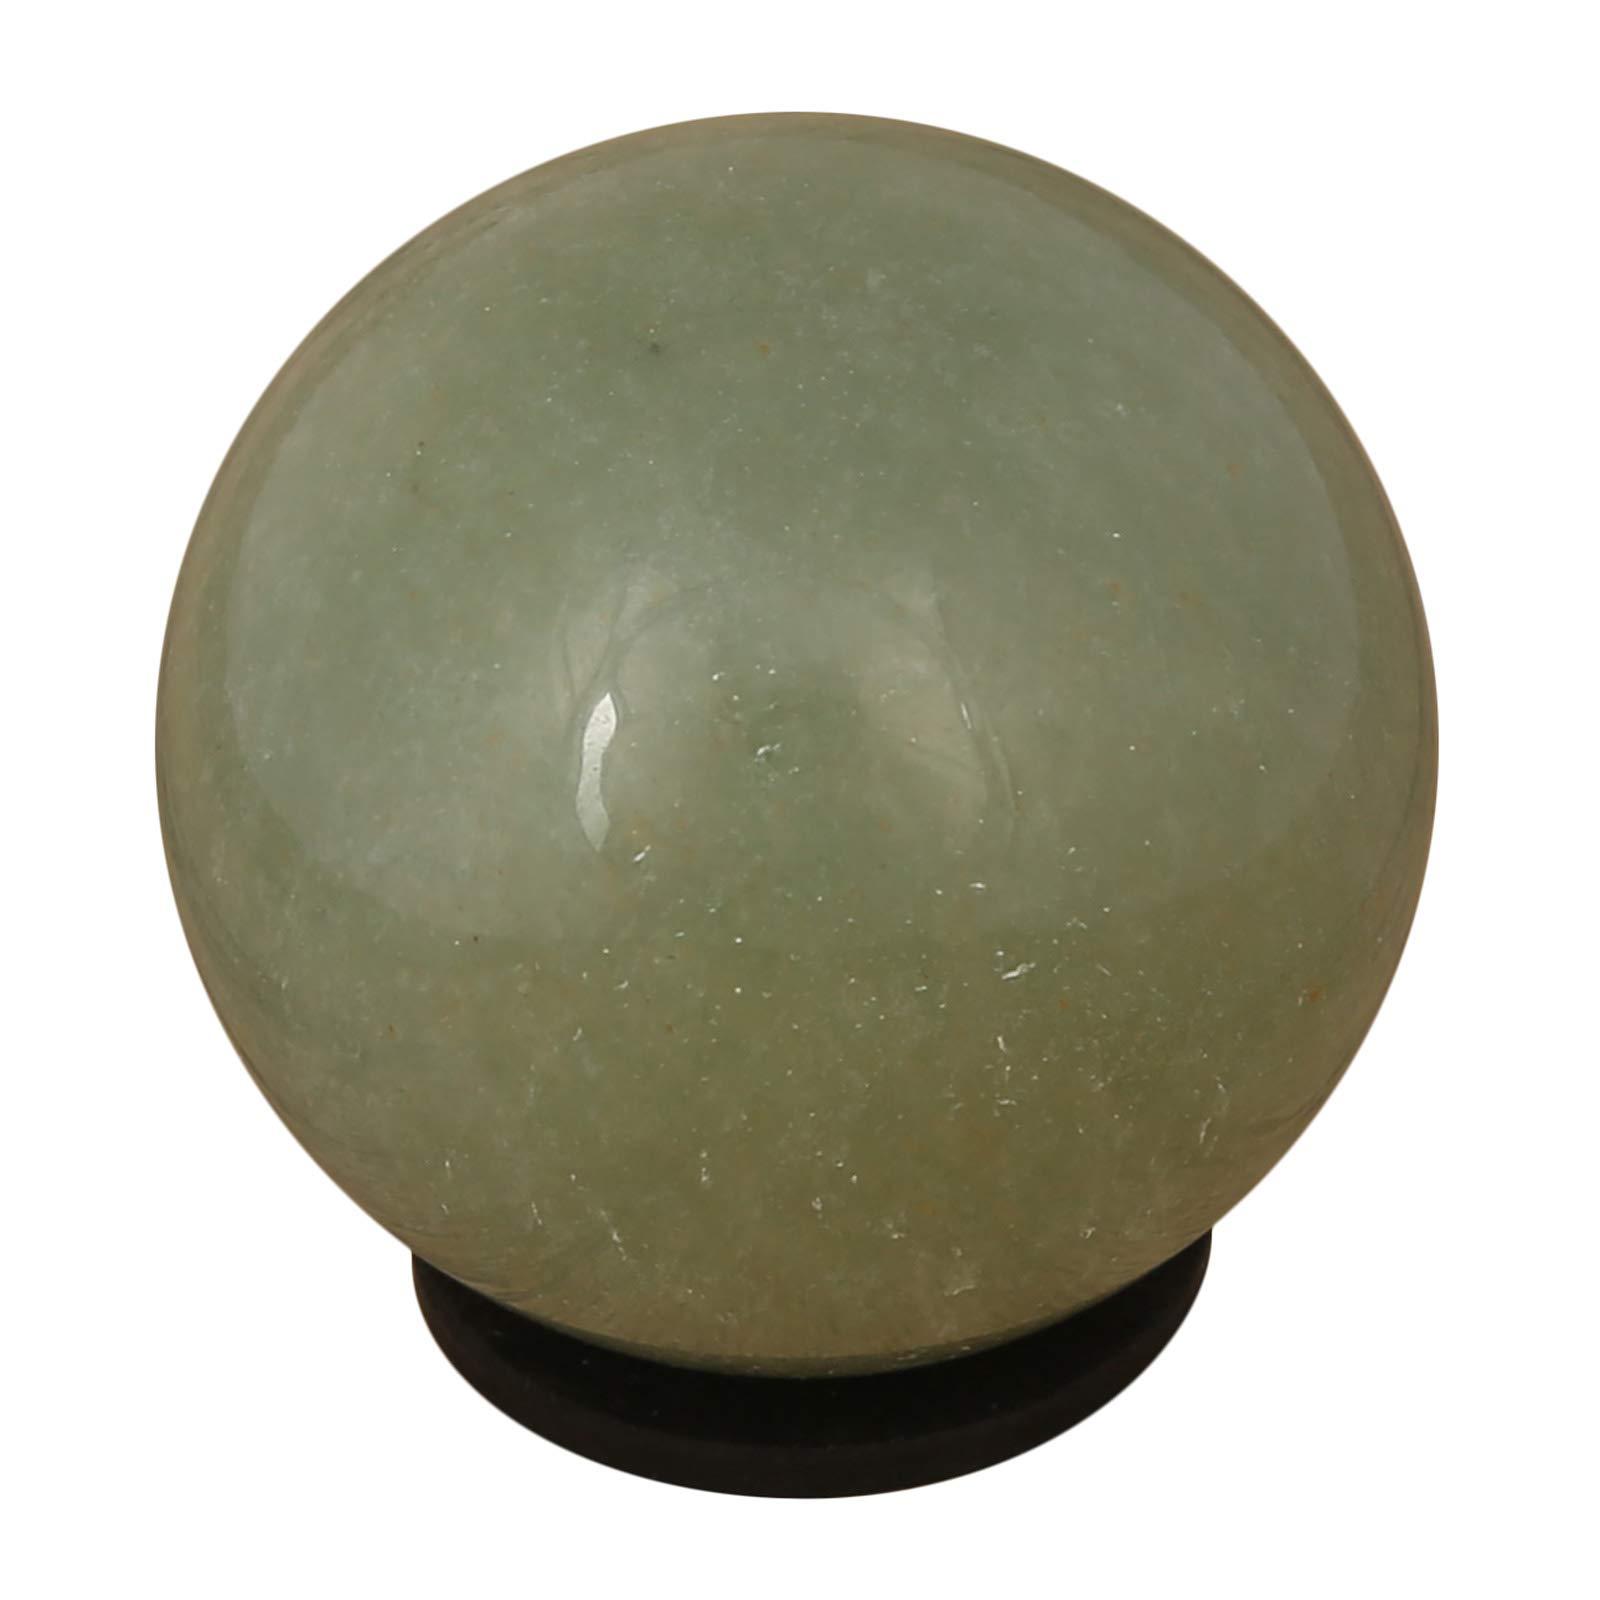 CRAFTSTRIBE Natural Green Aventurine Sphere Ball Crystal Gemstone Healing Reiki Stone Gift